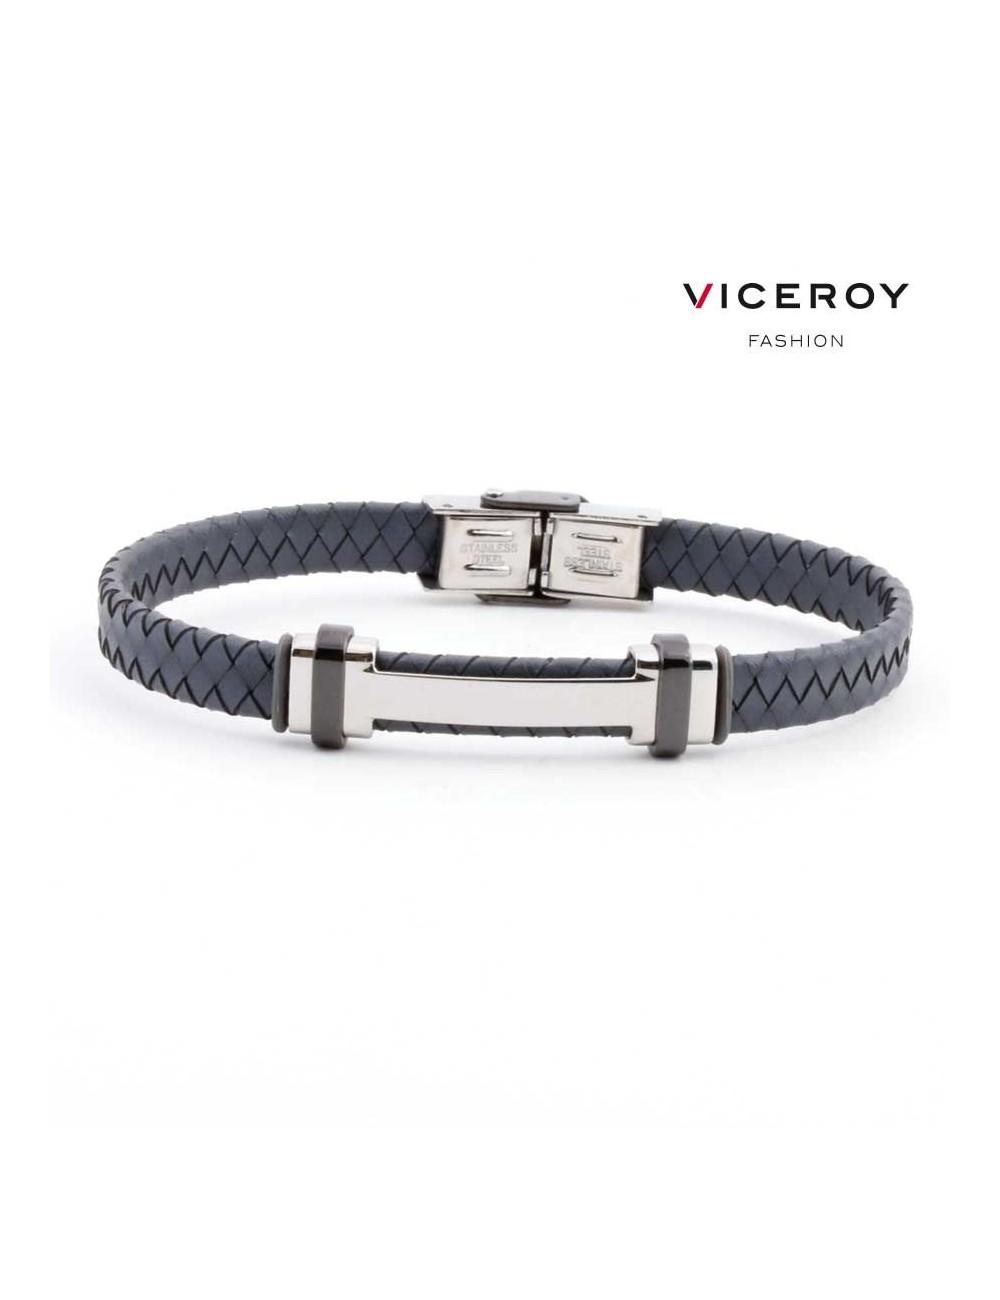 6e247bc570ff Pulsera Viceroy Fashion hombre acero H piel trenzada gris 6336P09000 ...